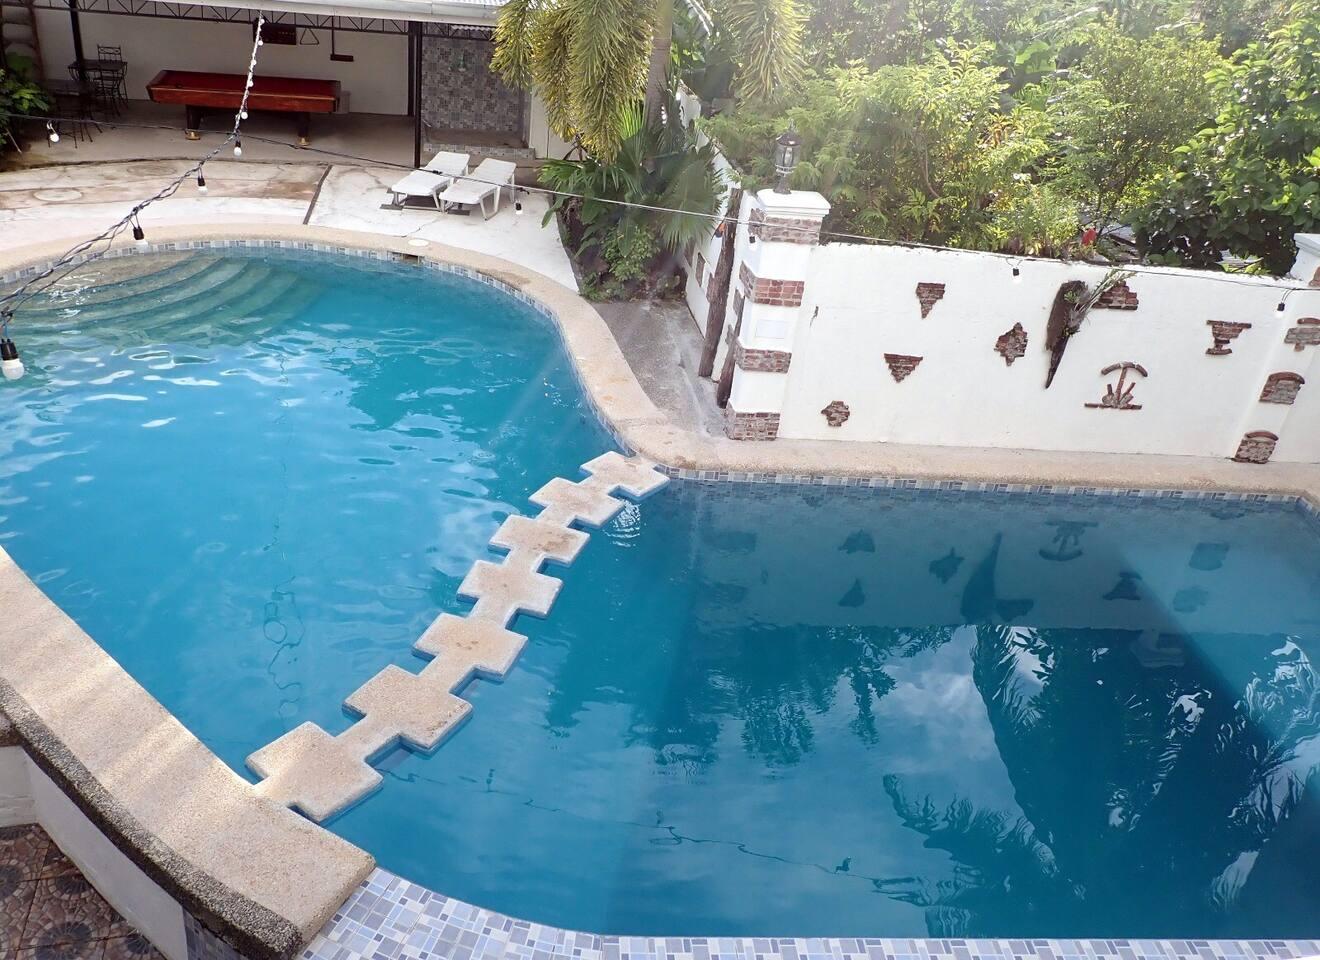 Scuba training pool